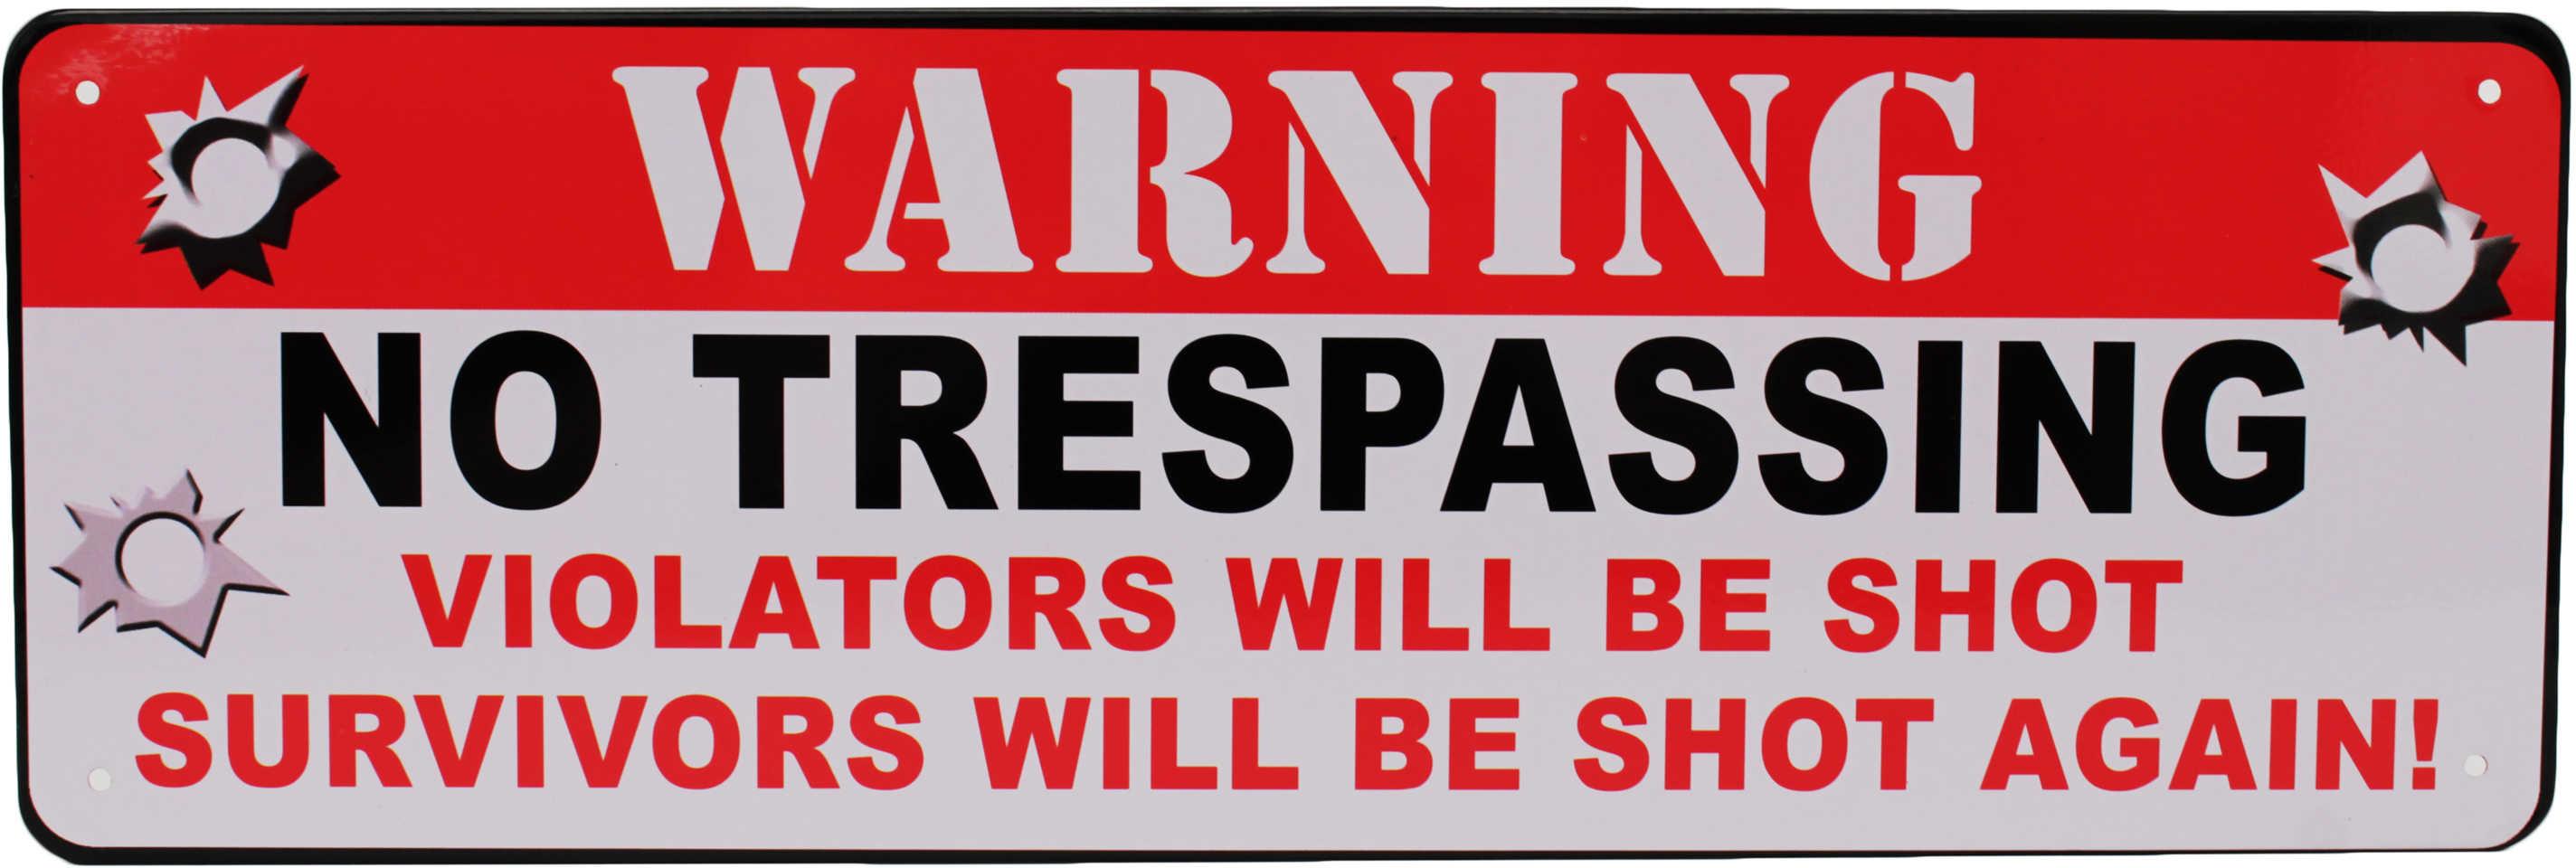 "Rivers Edge Products 10.5"" x 3.5"" Tin Sign Warning No Trespassing 1426"